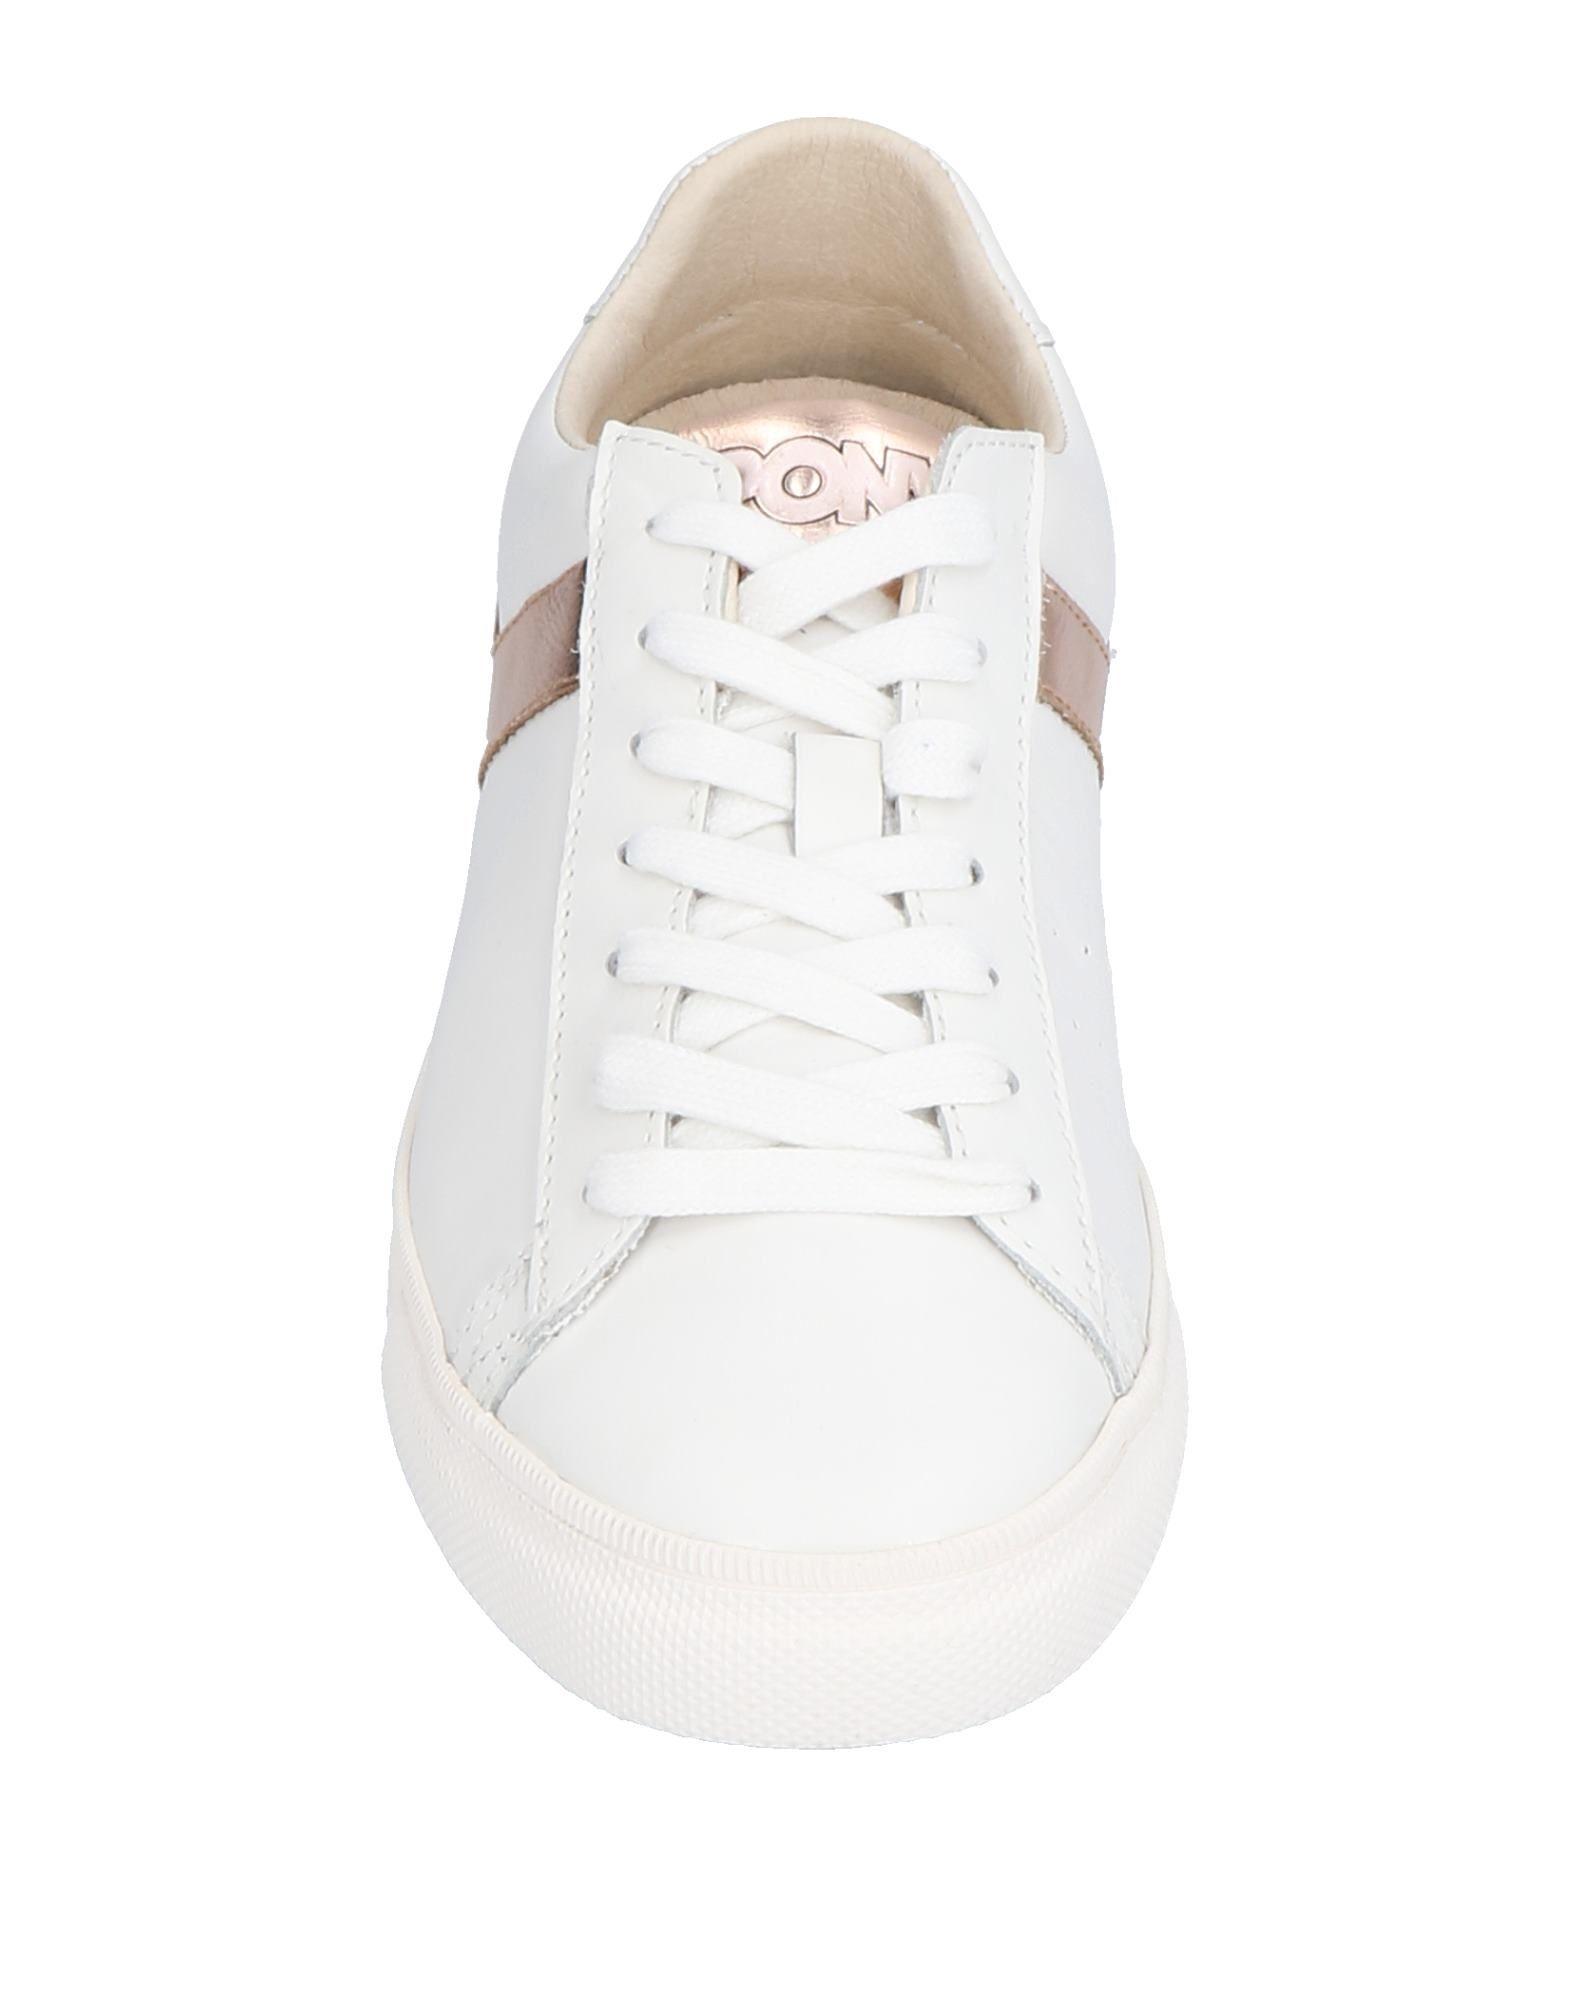 Pony 11496532VO Sneakers Damen  11496532VO Pony Gute Qualität beliebte Schuhe 571a45